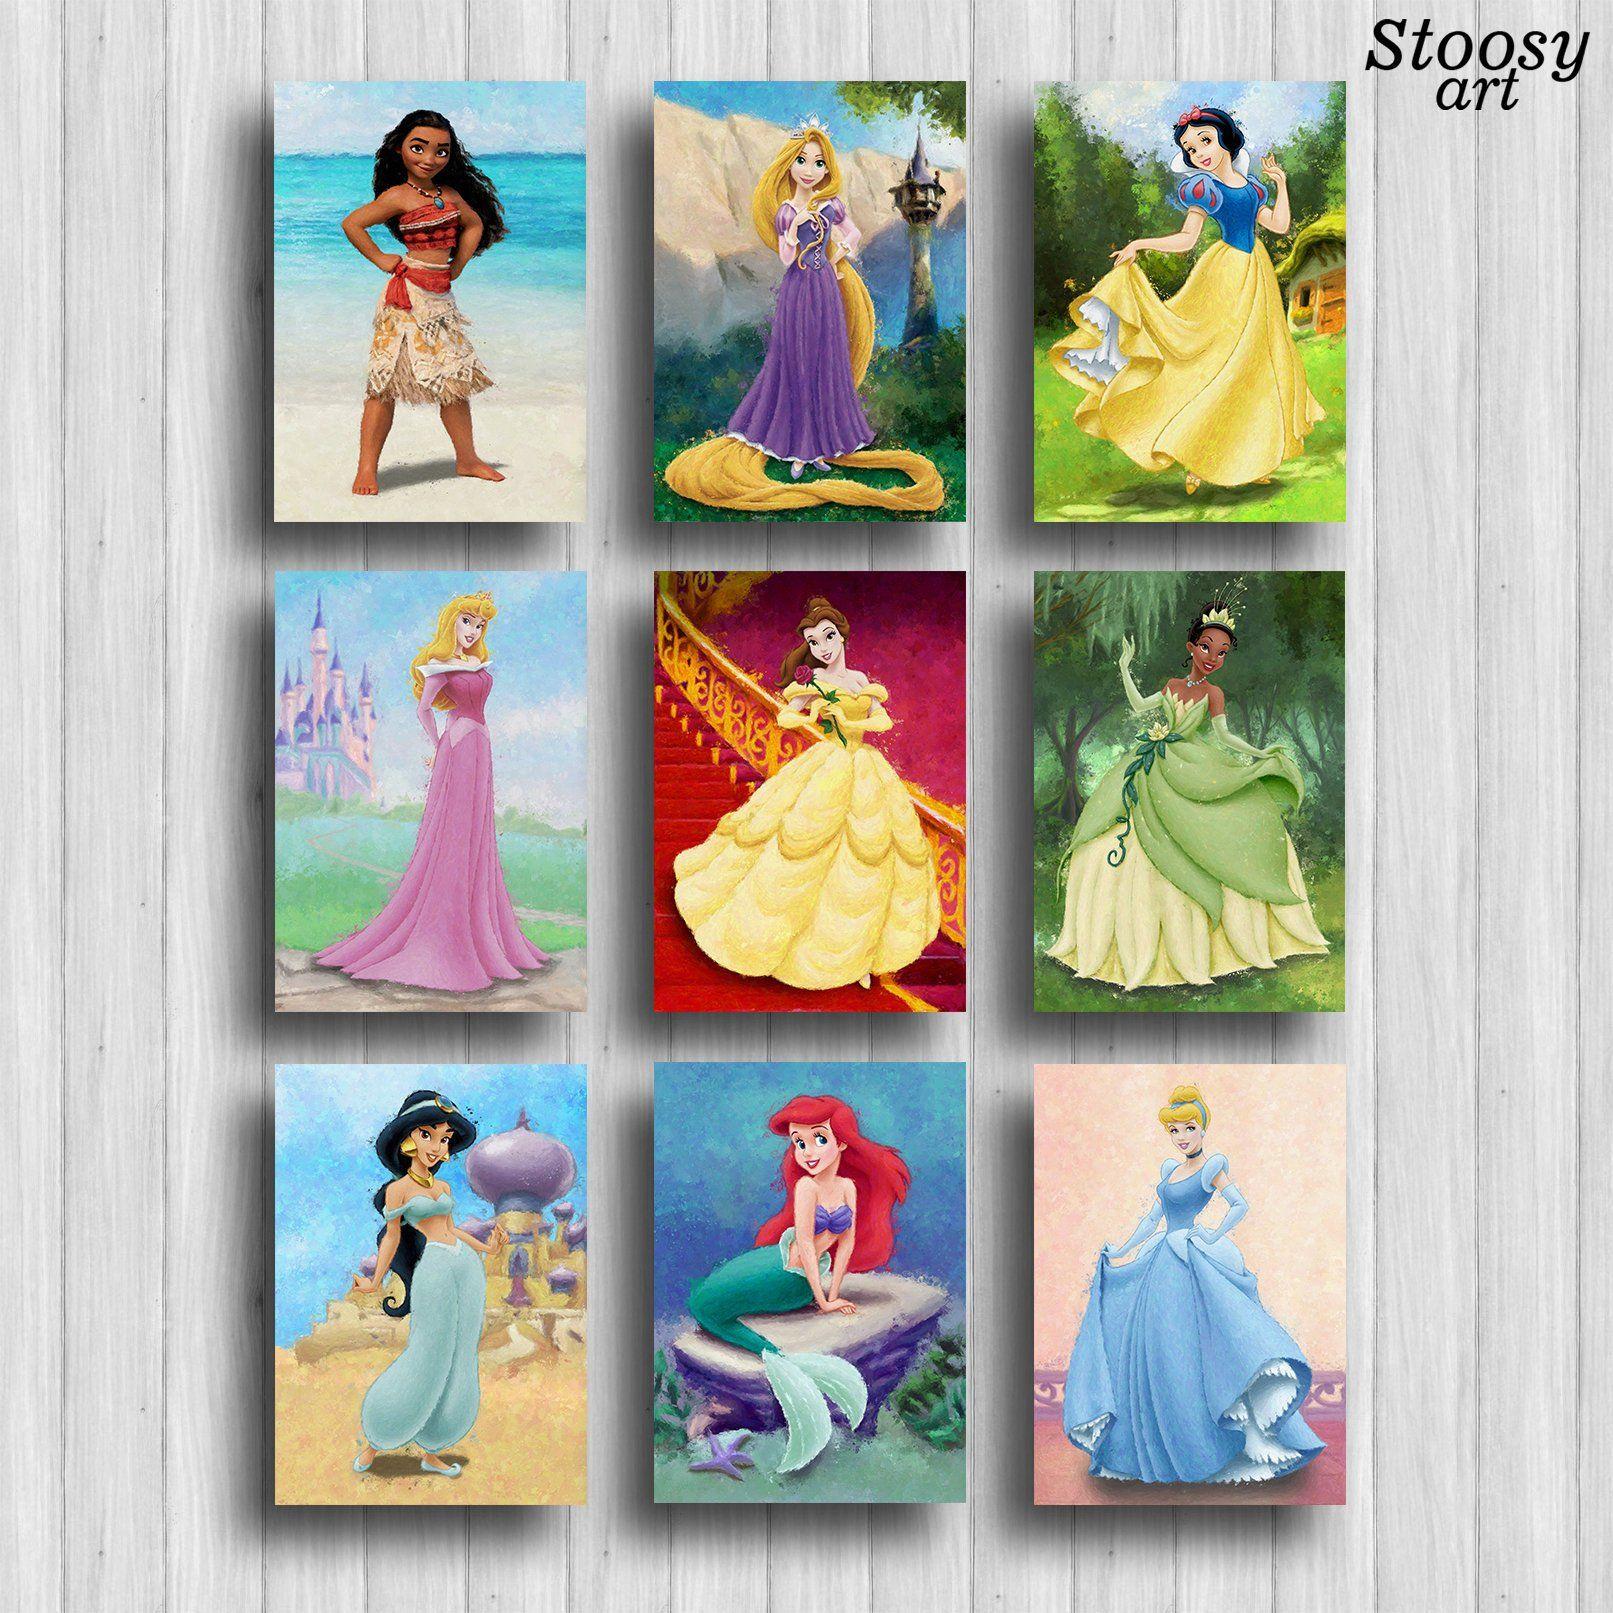 Disney Princess Posters Set Of 9 Princess Artwork Disney Wall